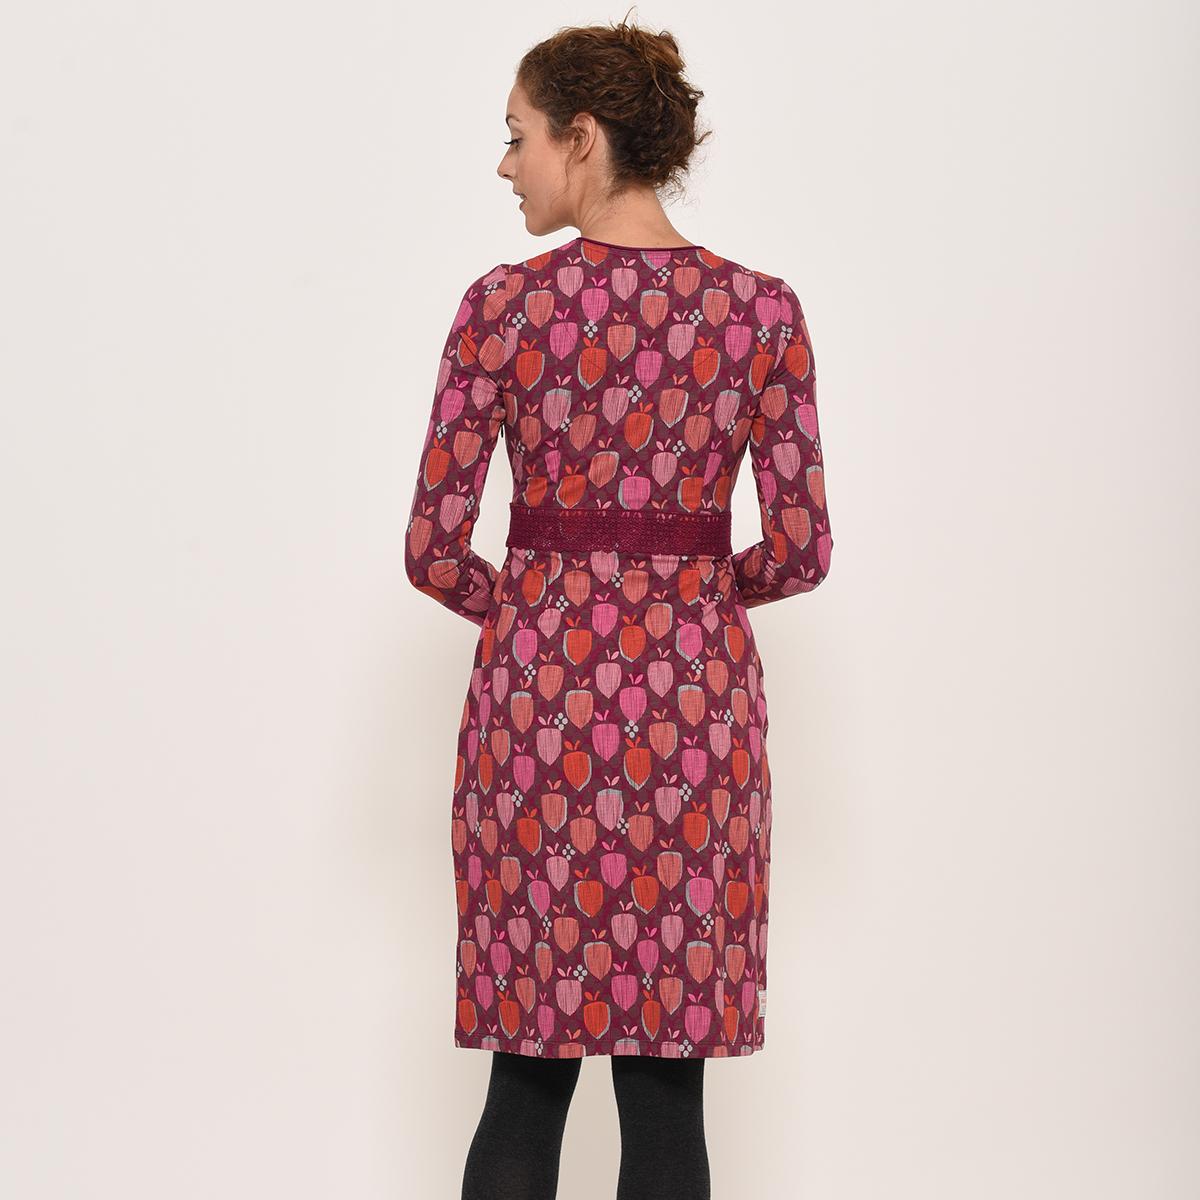 Brakeburn Acorn Wrap Dress - size 8 only left